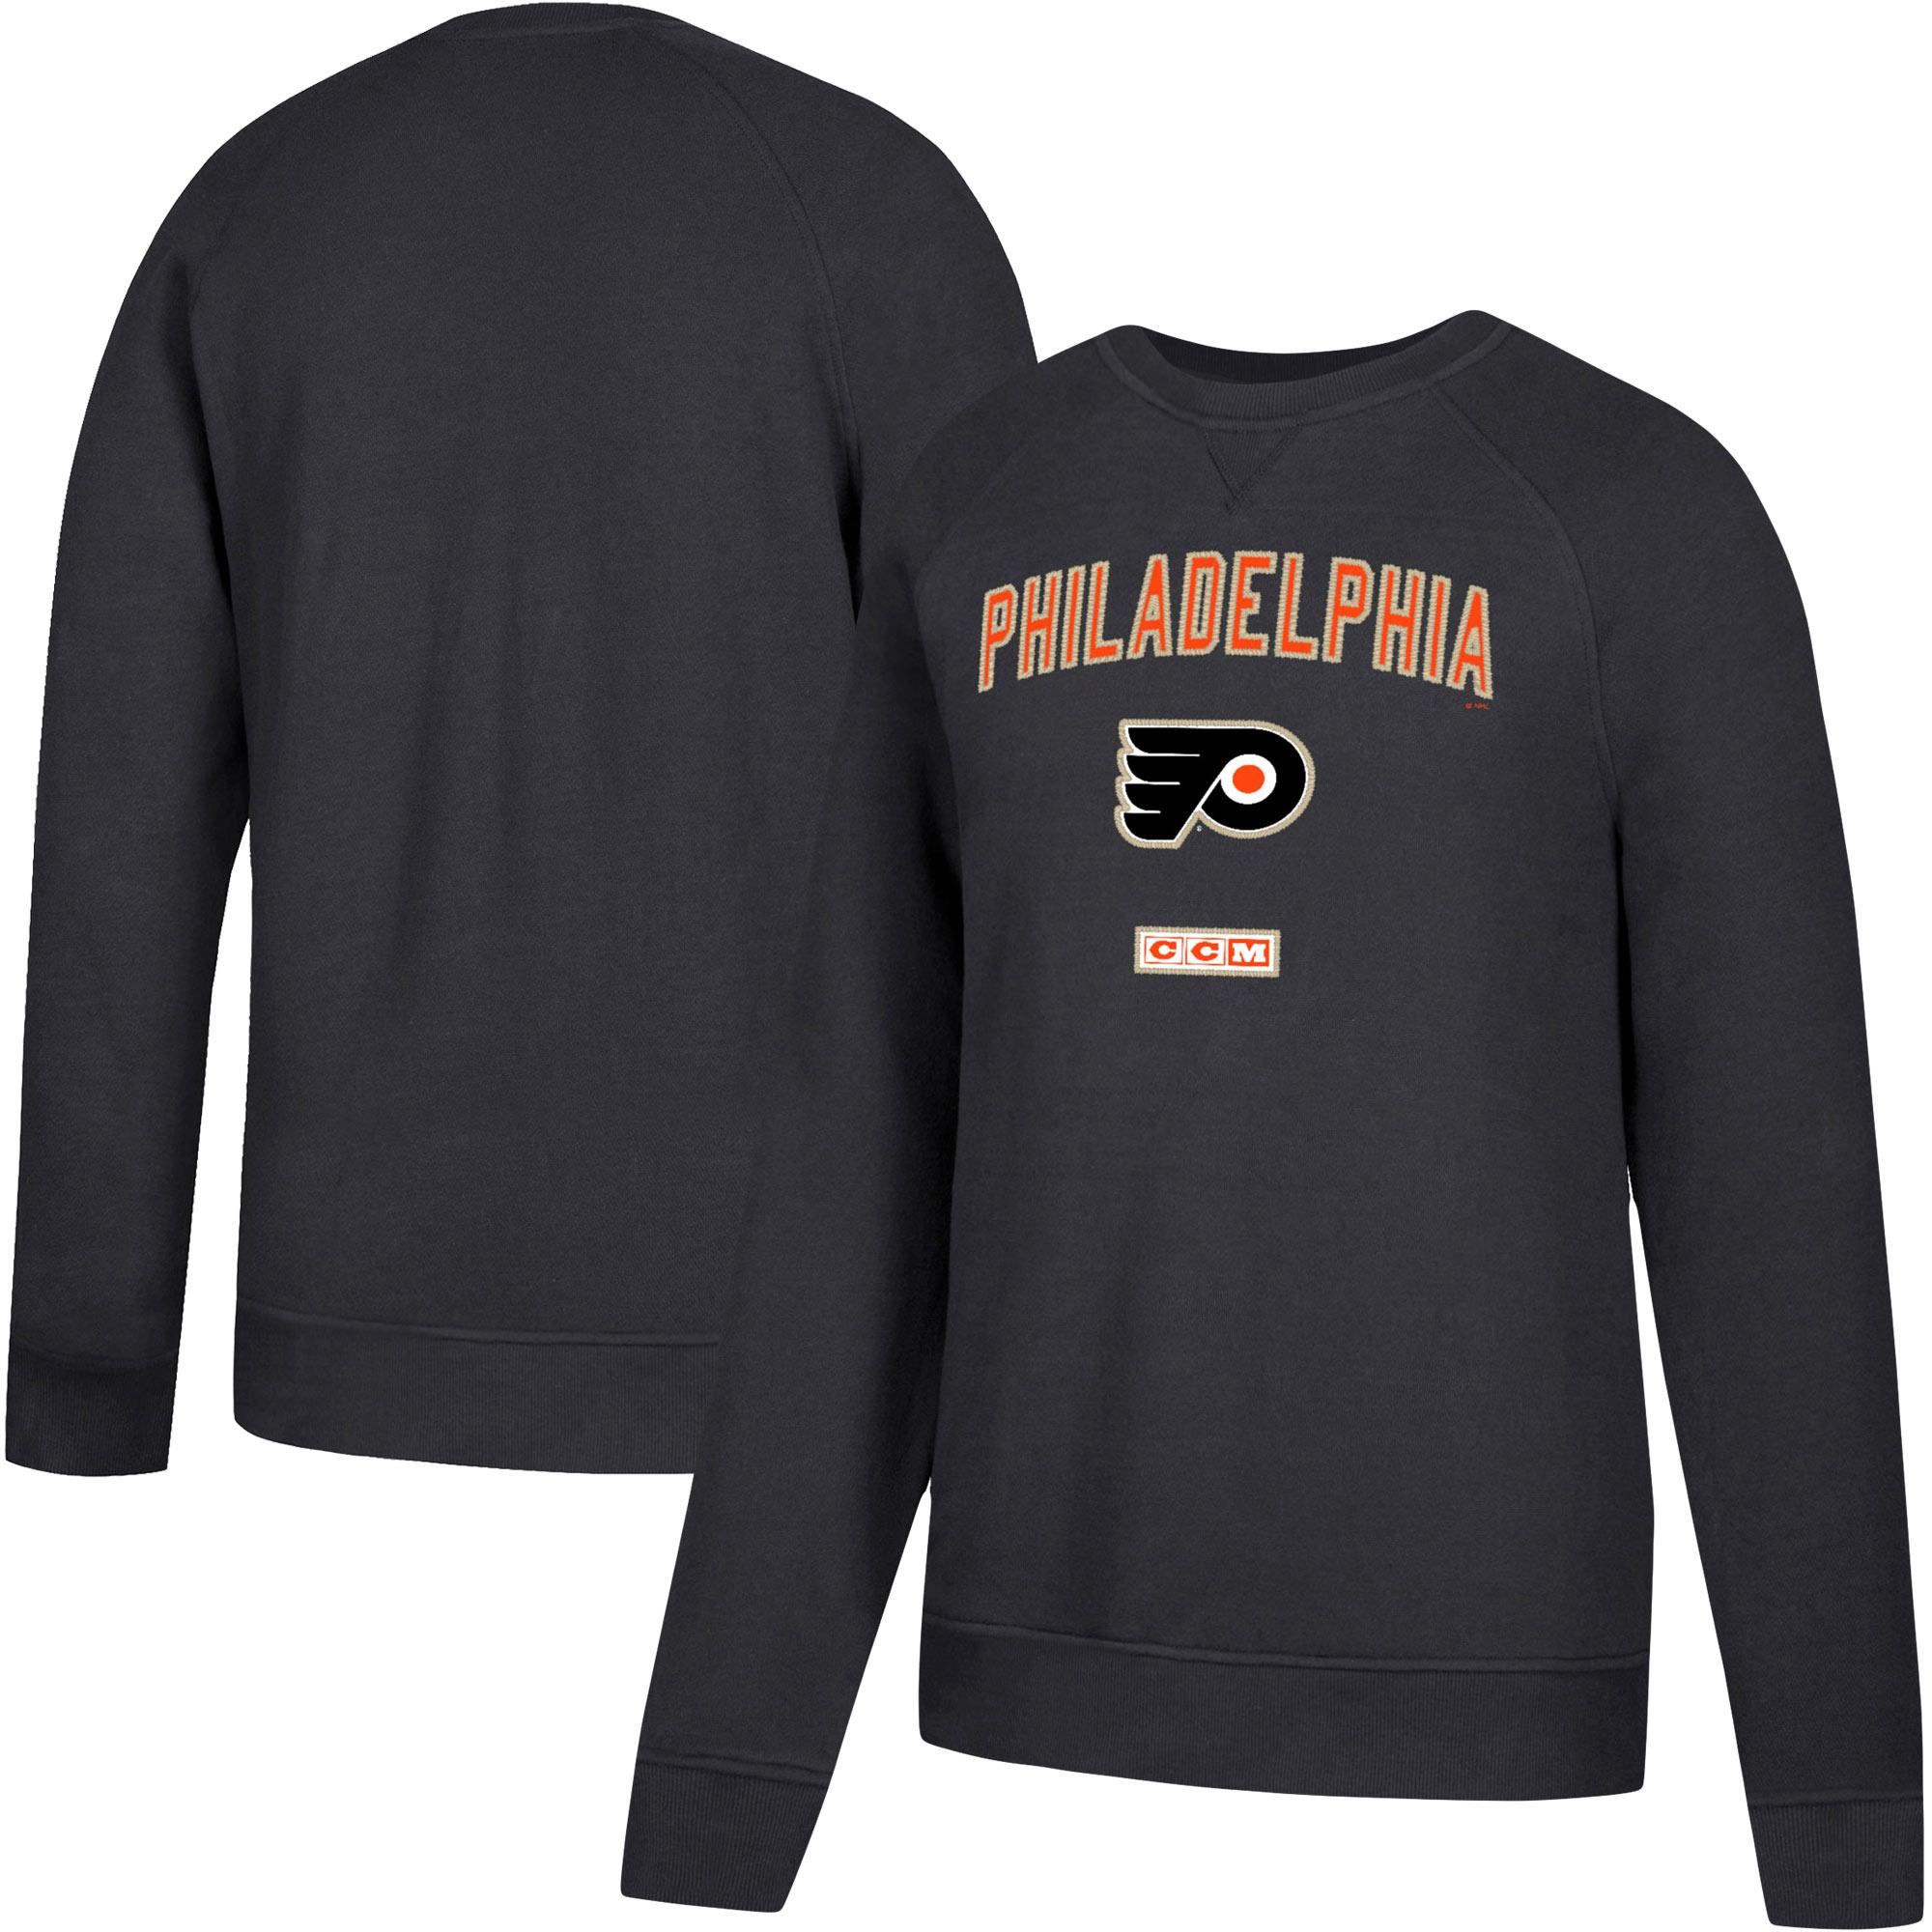 Philadelphia Flyers CCM Fleece Pullover Sweatshirt - Black